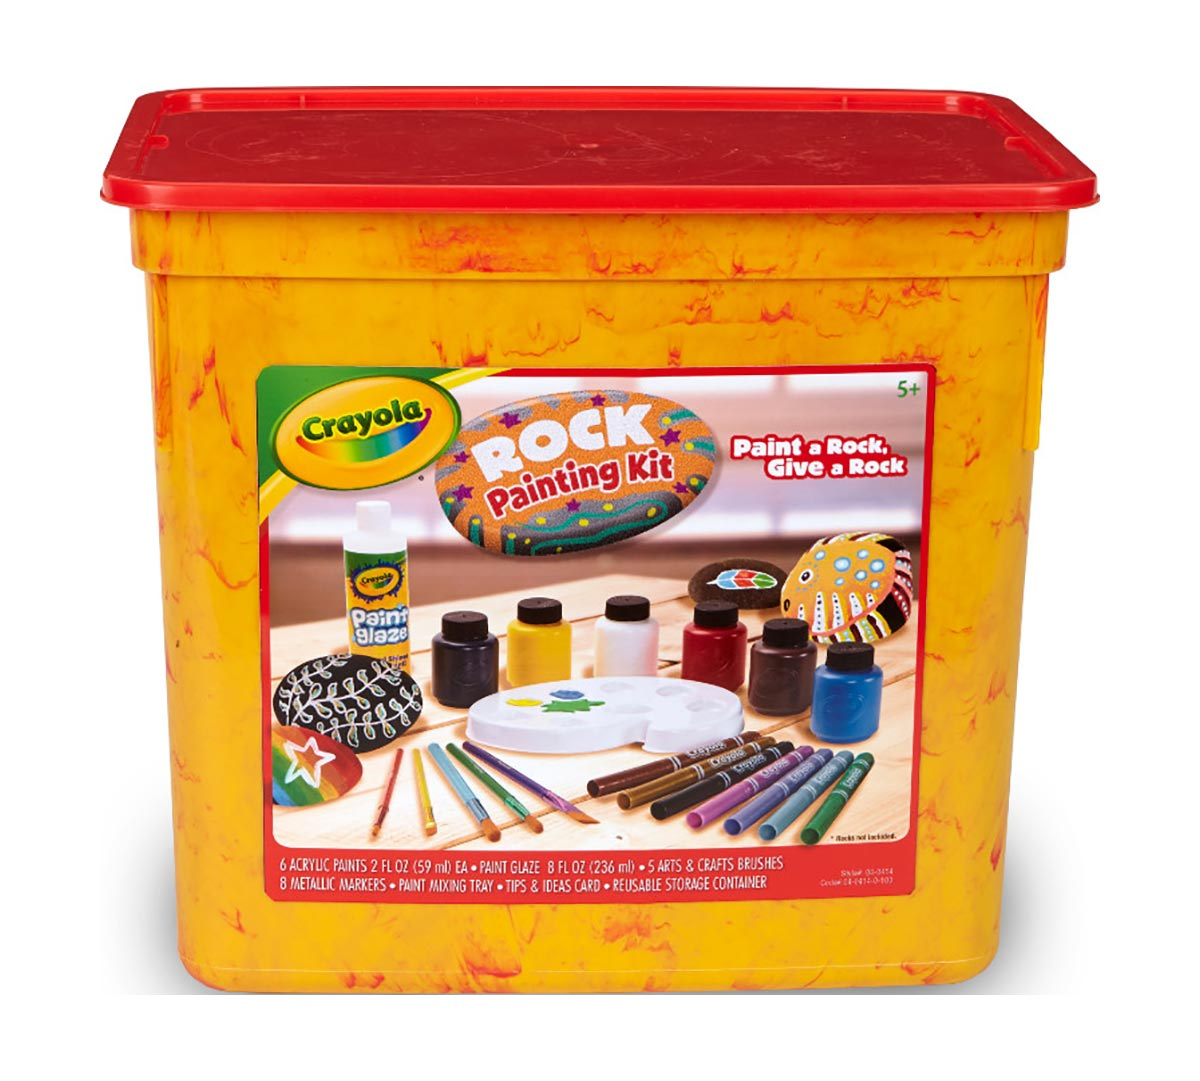 Crayola Rock Painting Set